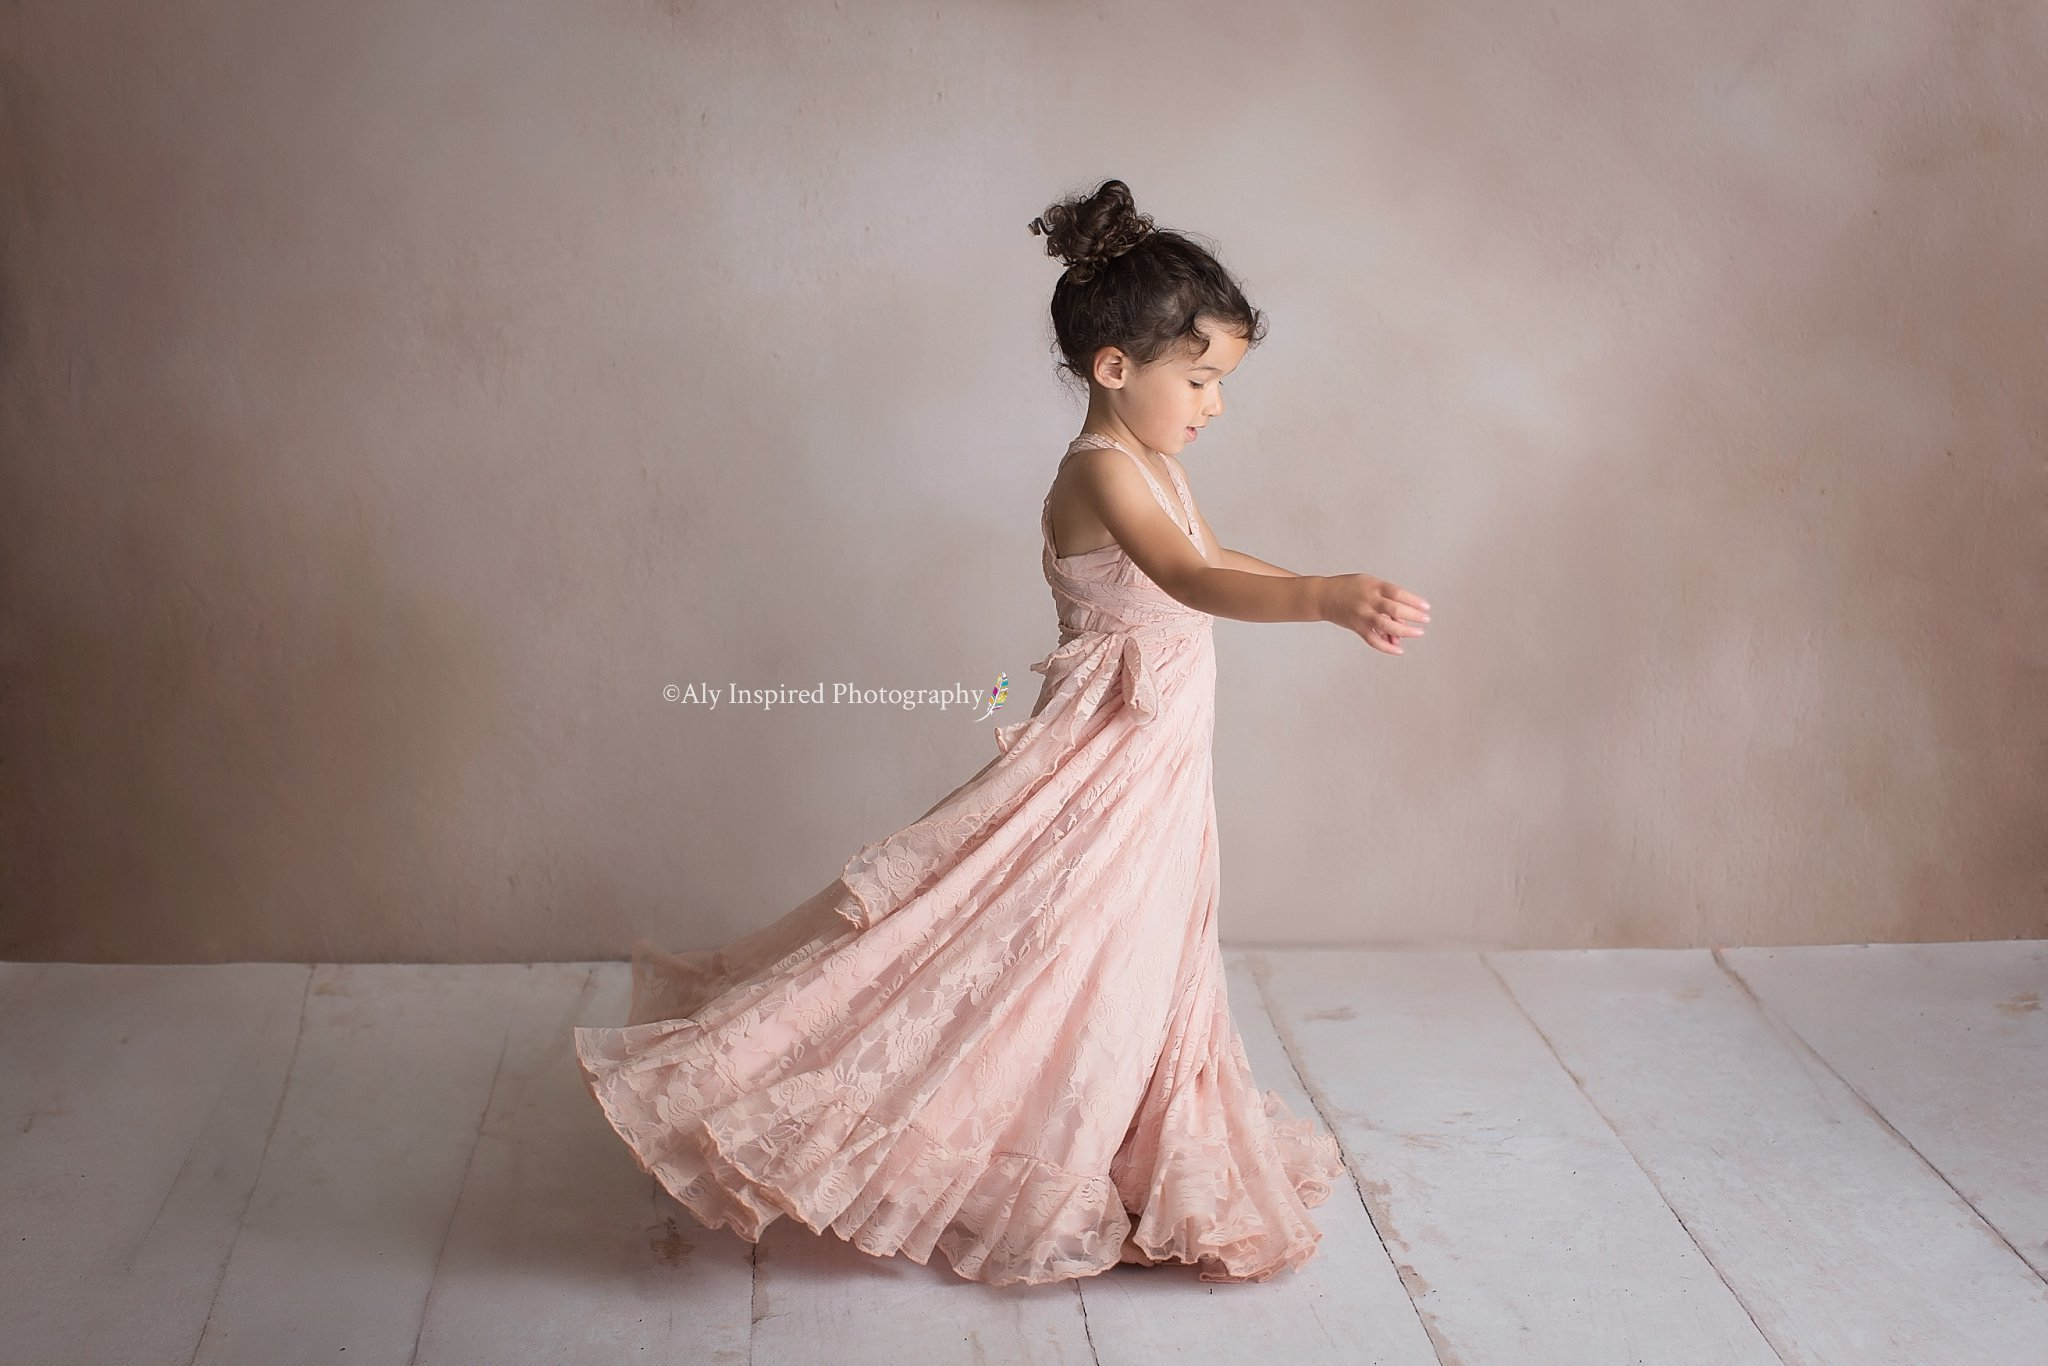 Sl;oan girls lace infinity dress, Miss Madison Boutique